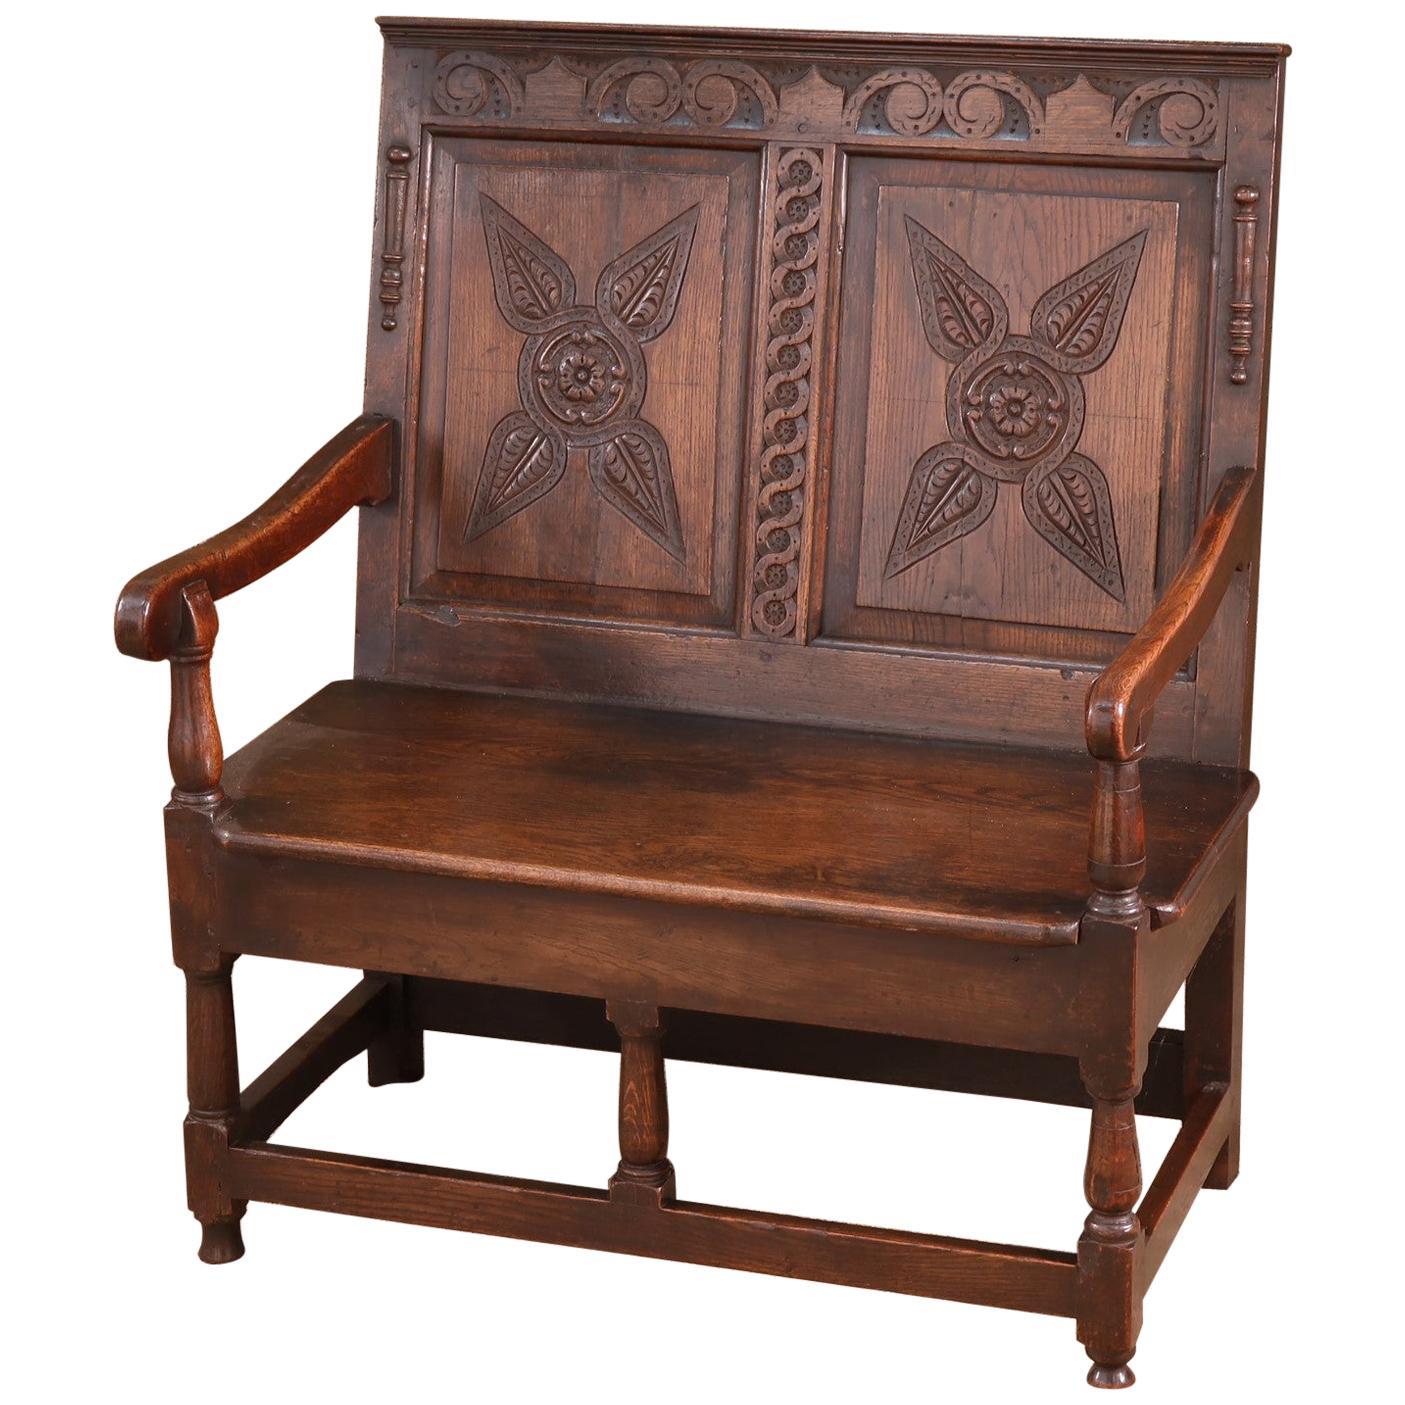 Antique English 19th Century 2-Seat Oak Settle